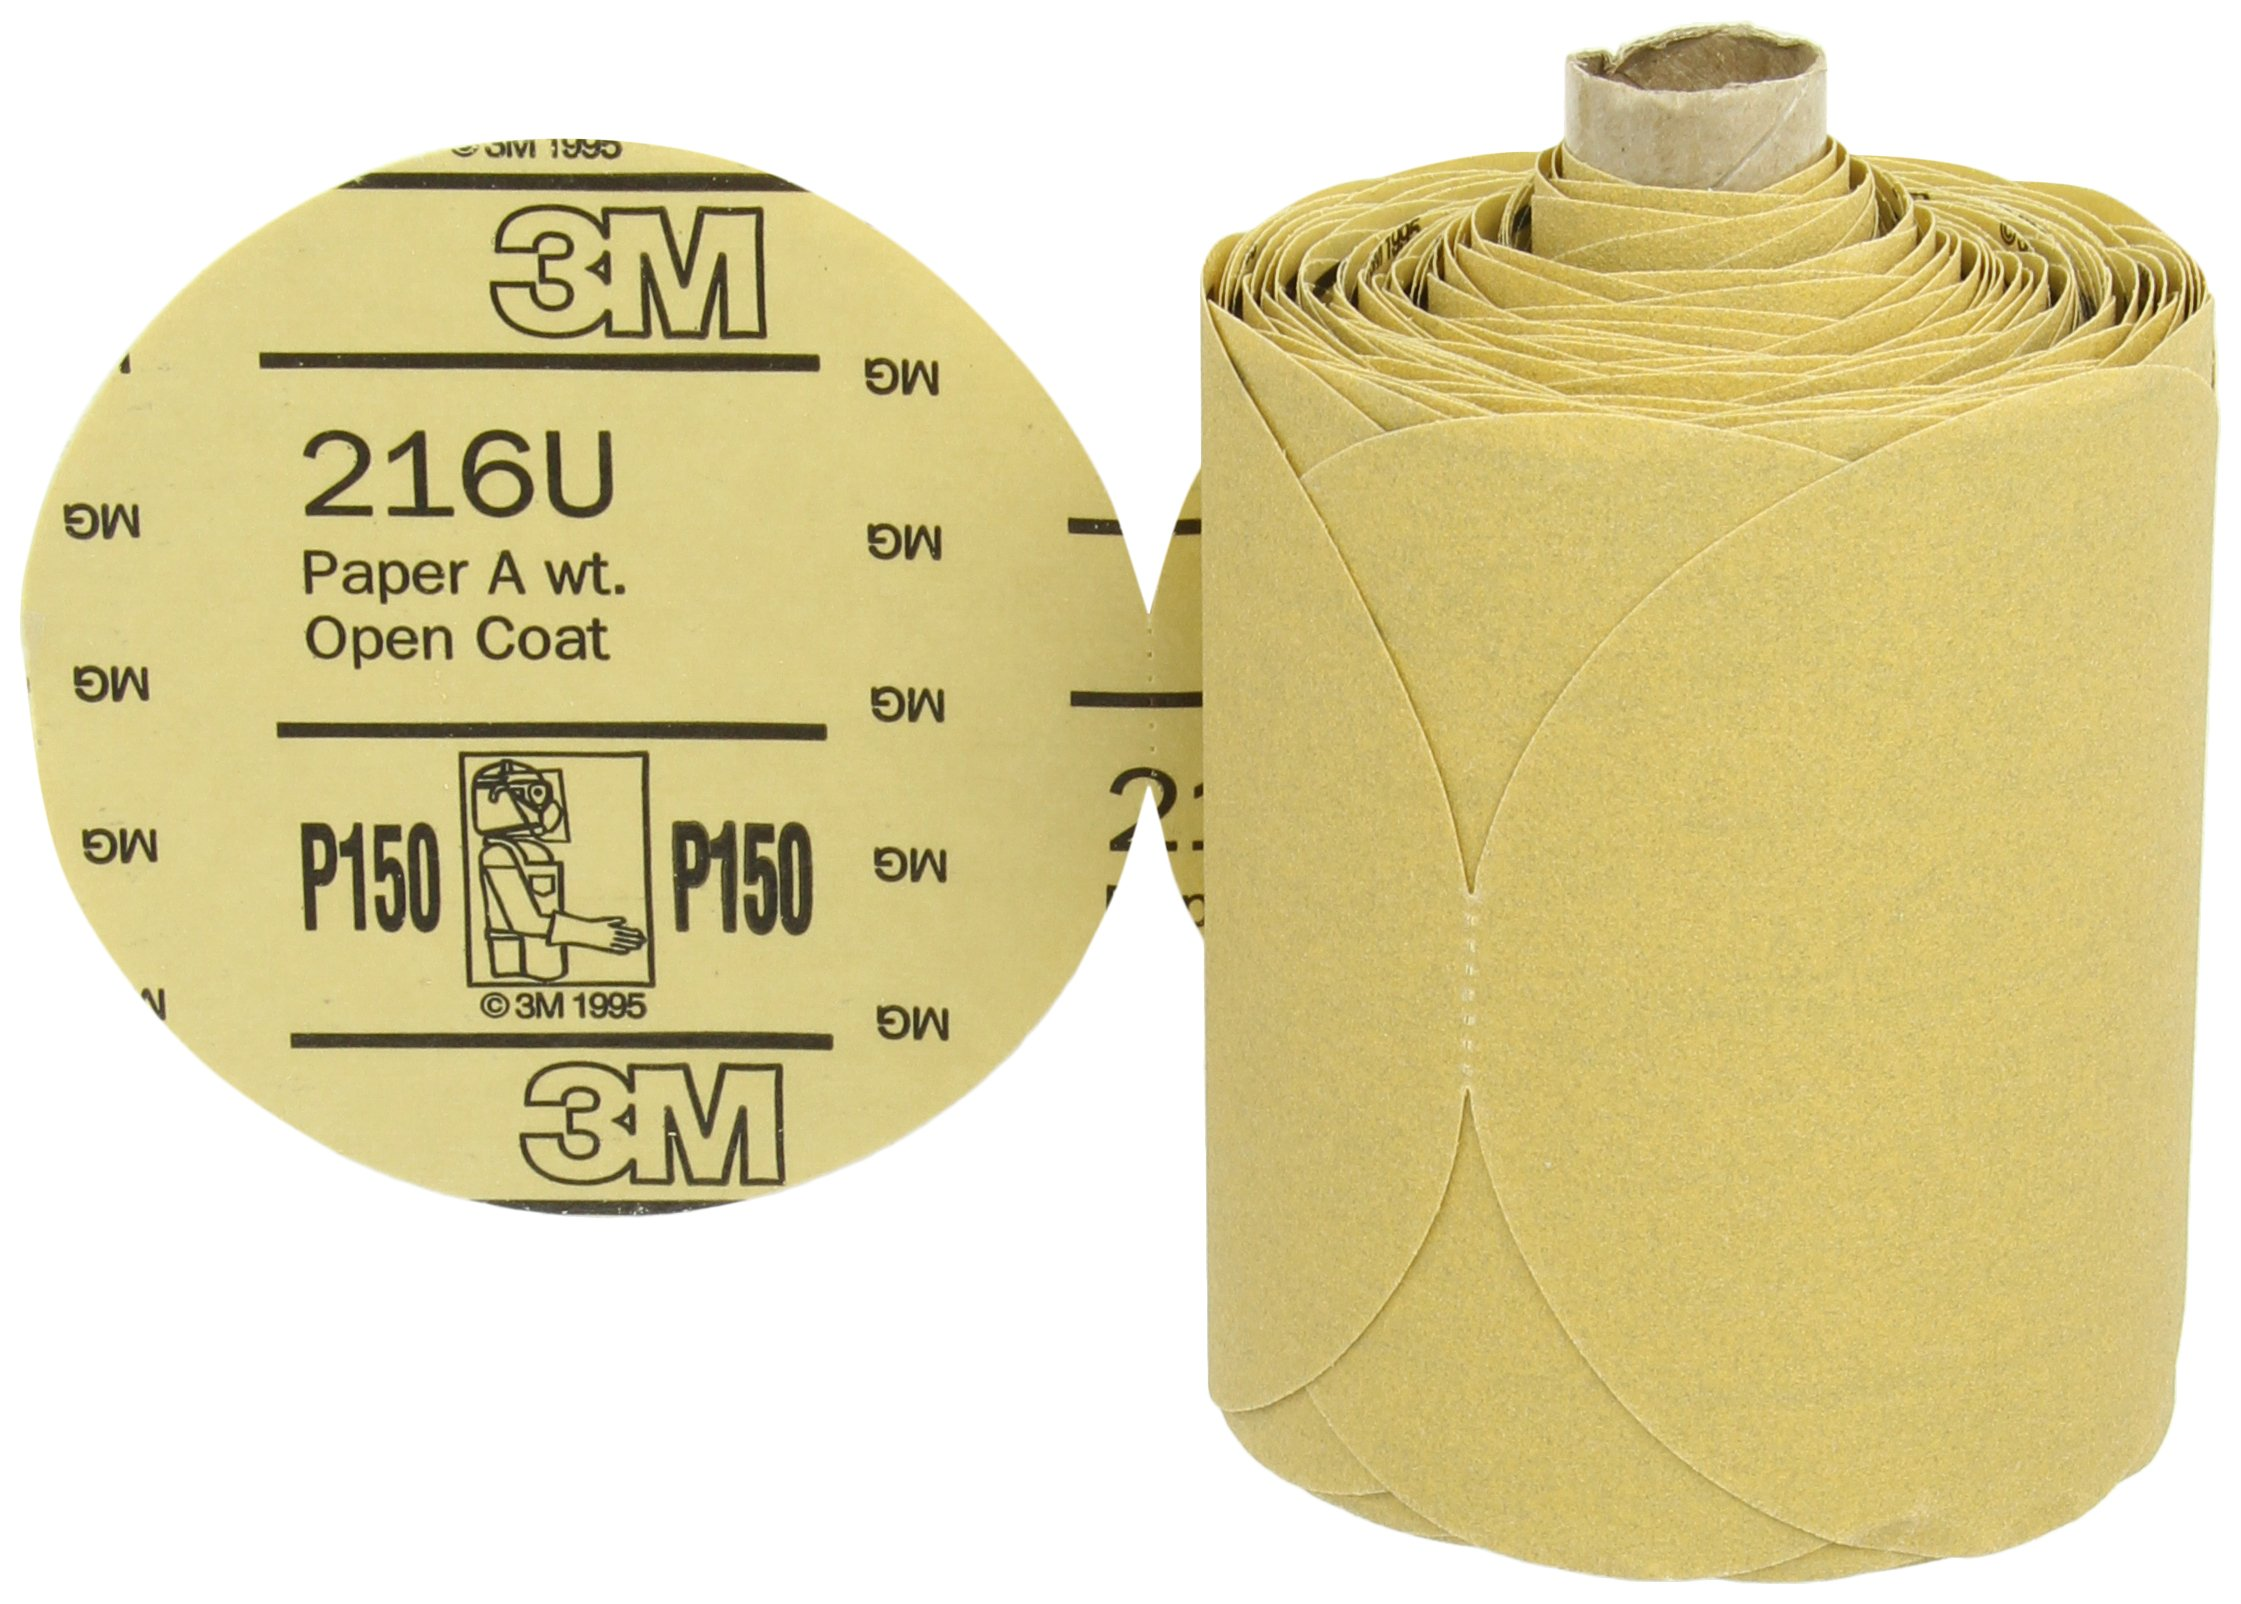 3M Stikit Gold Paper Disc Roll 216U, PSA Attachment, Aluminum Oxide, 5'' Diameter, P150 Grit (Roll of 175) by Cubitron